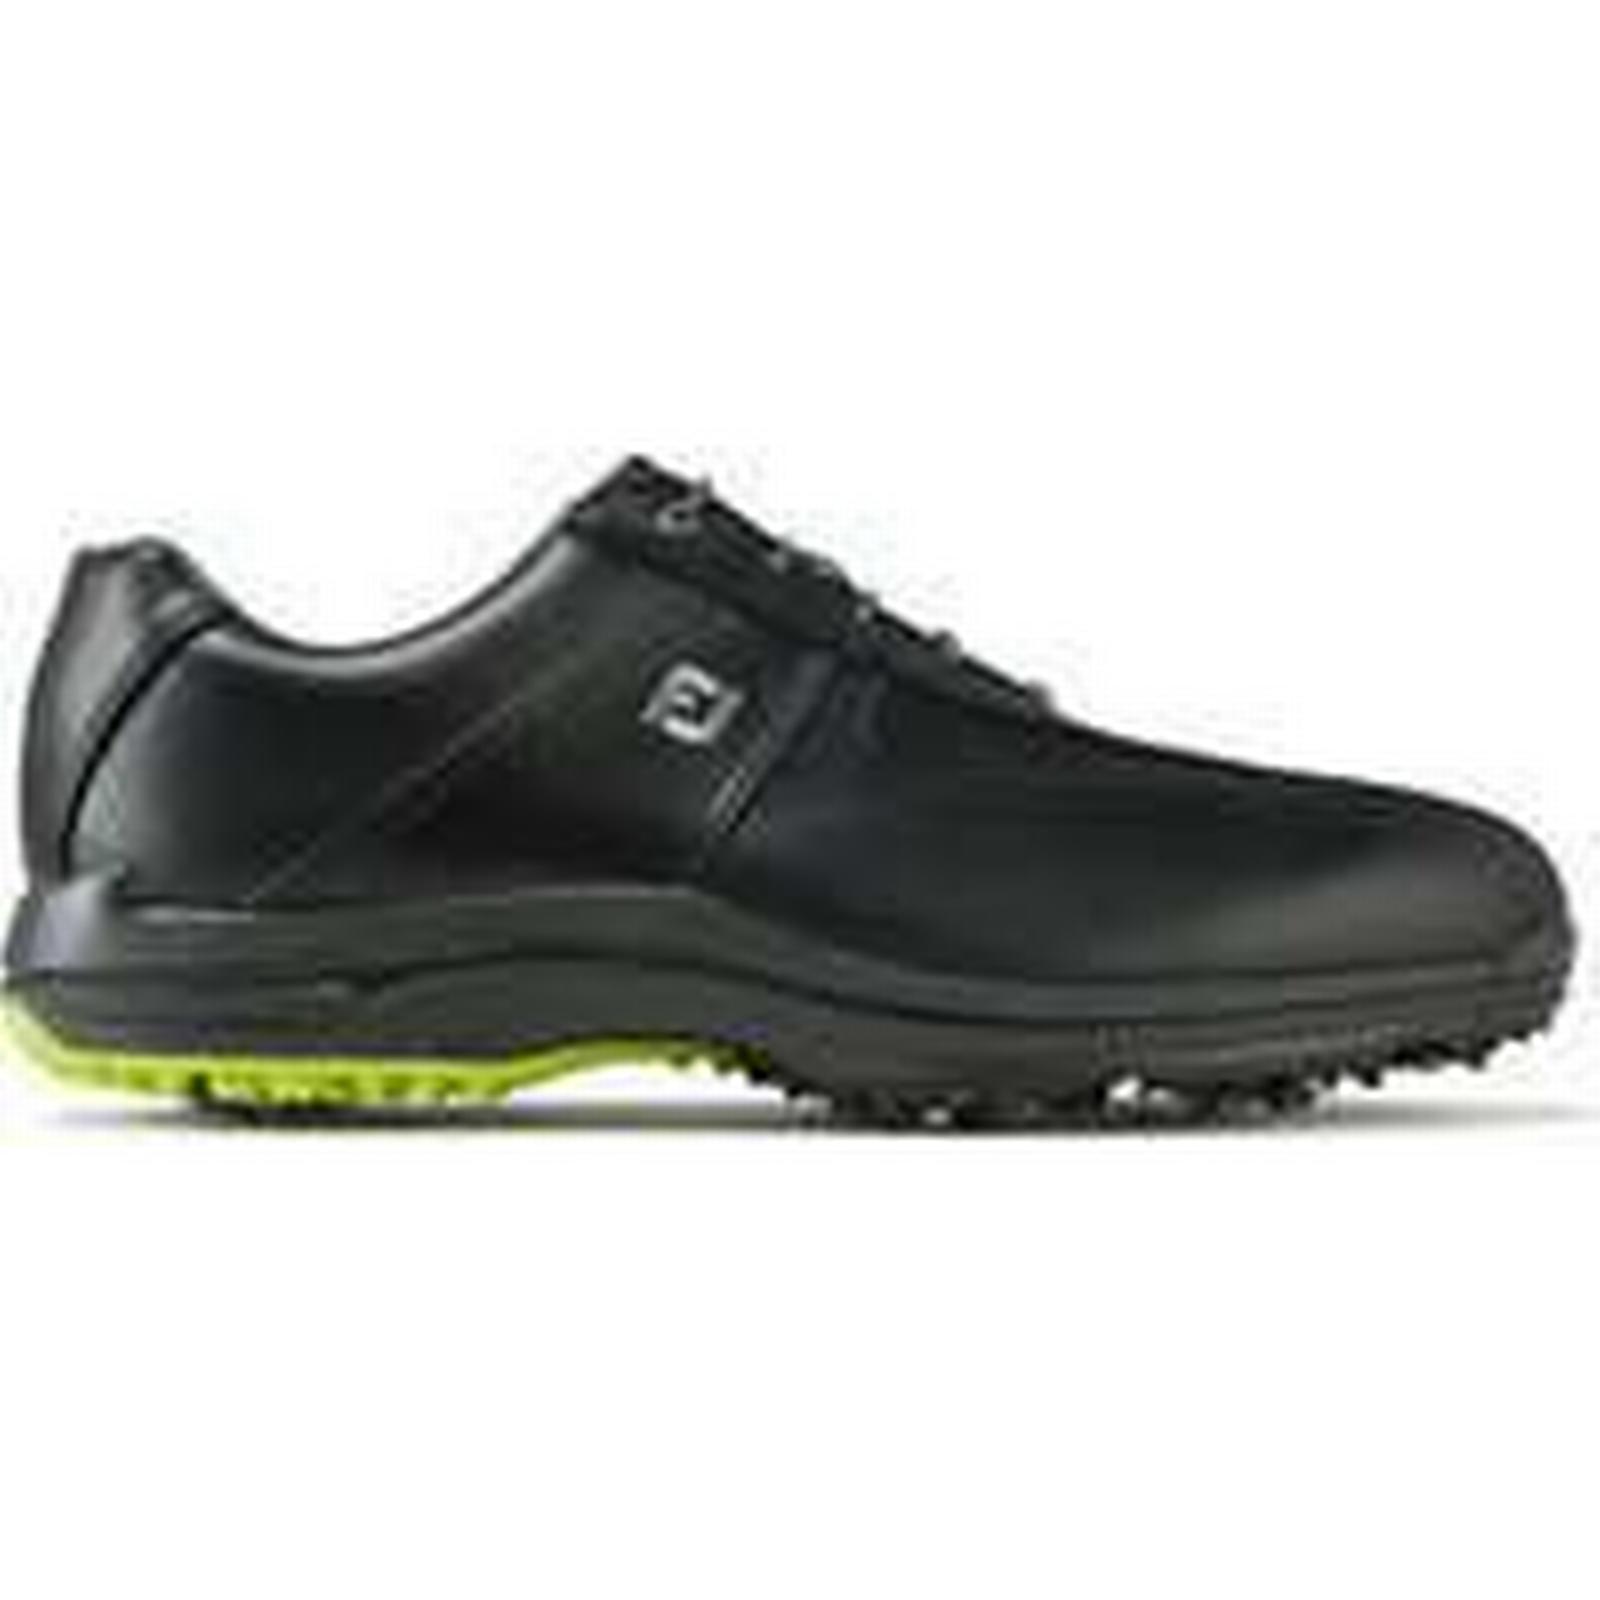 Footjoy 2018 Black Greenjoys Golf Shoes - Black 2018 f1a33b